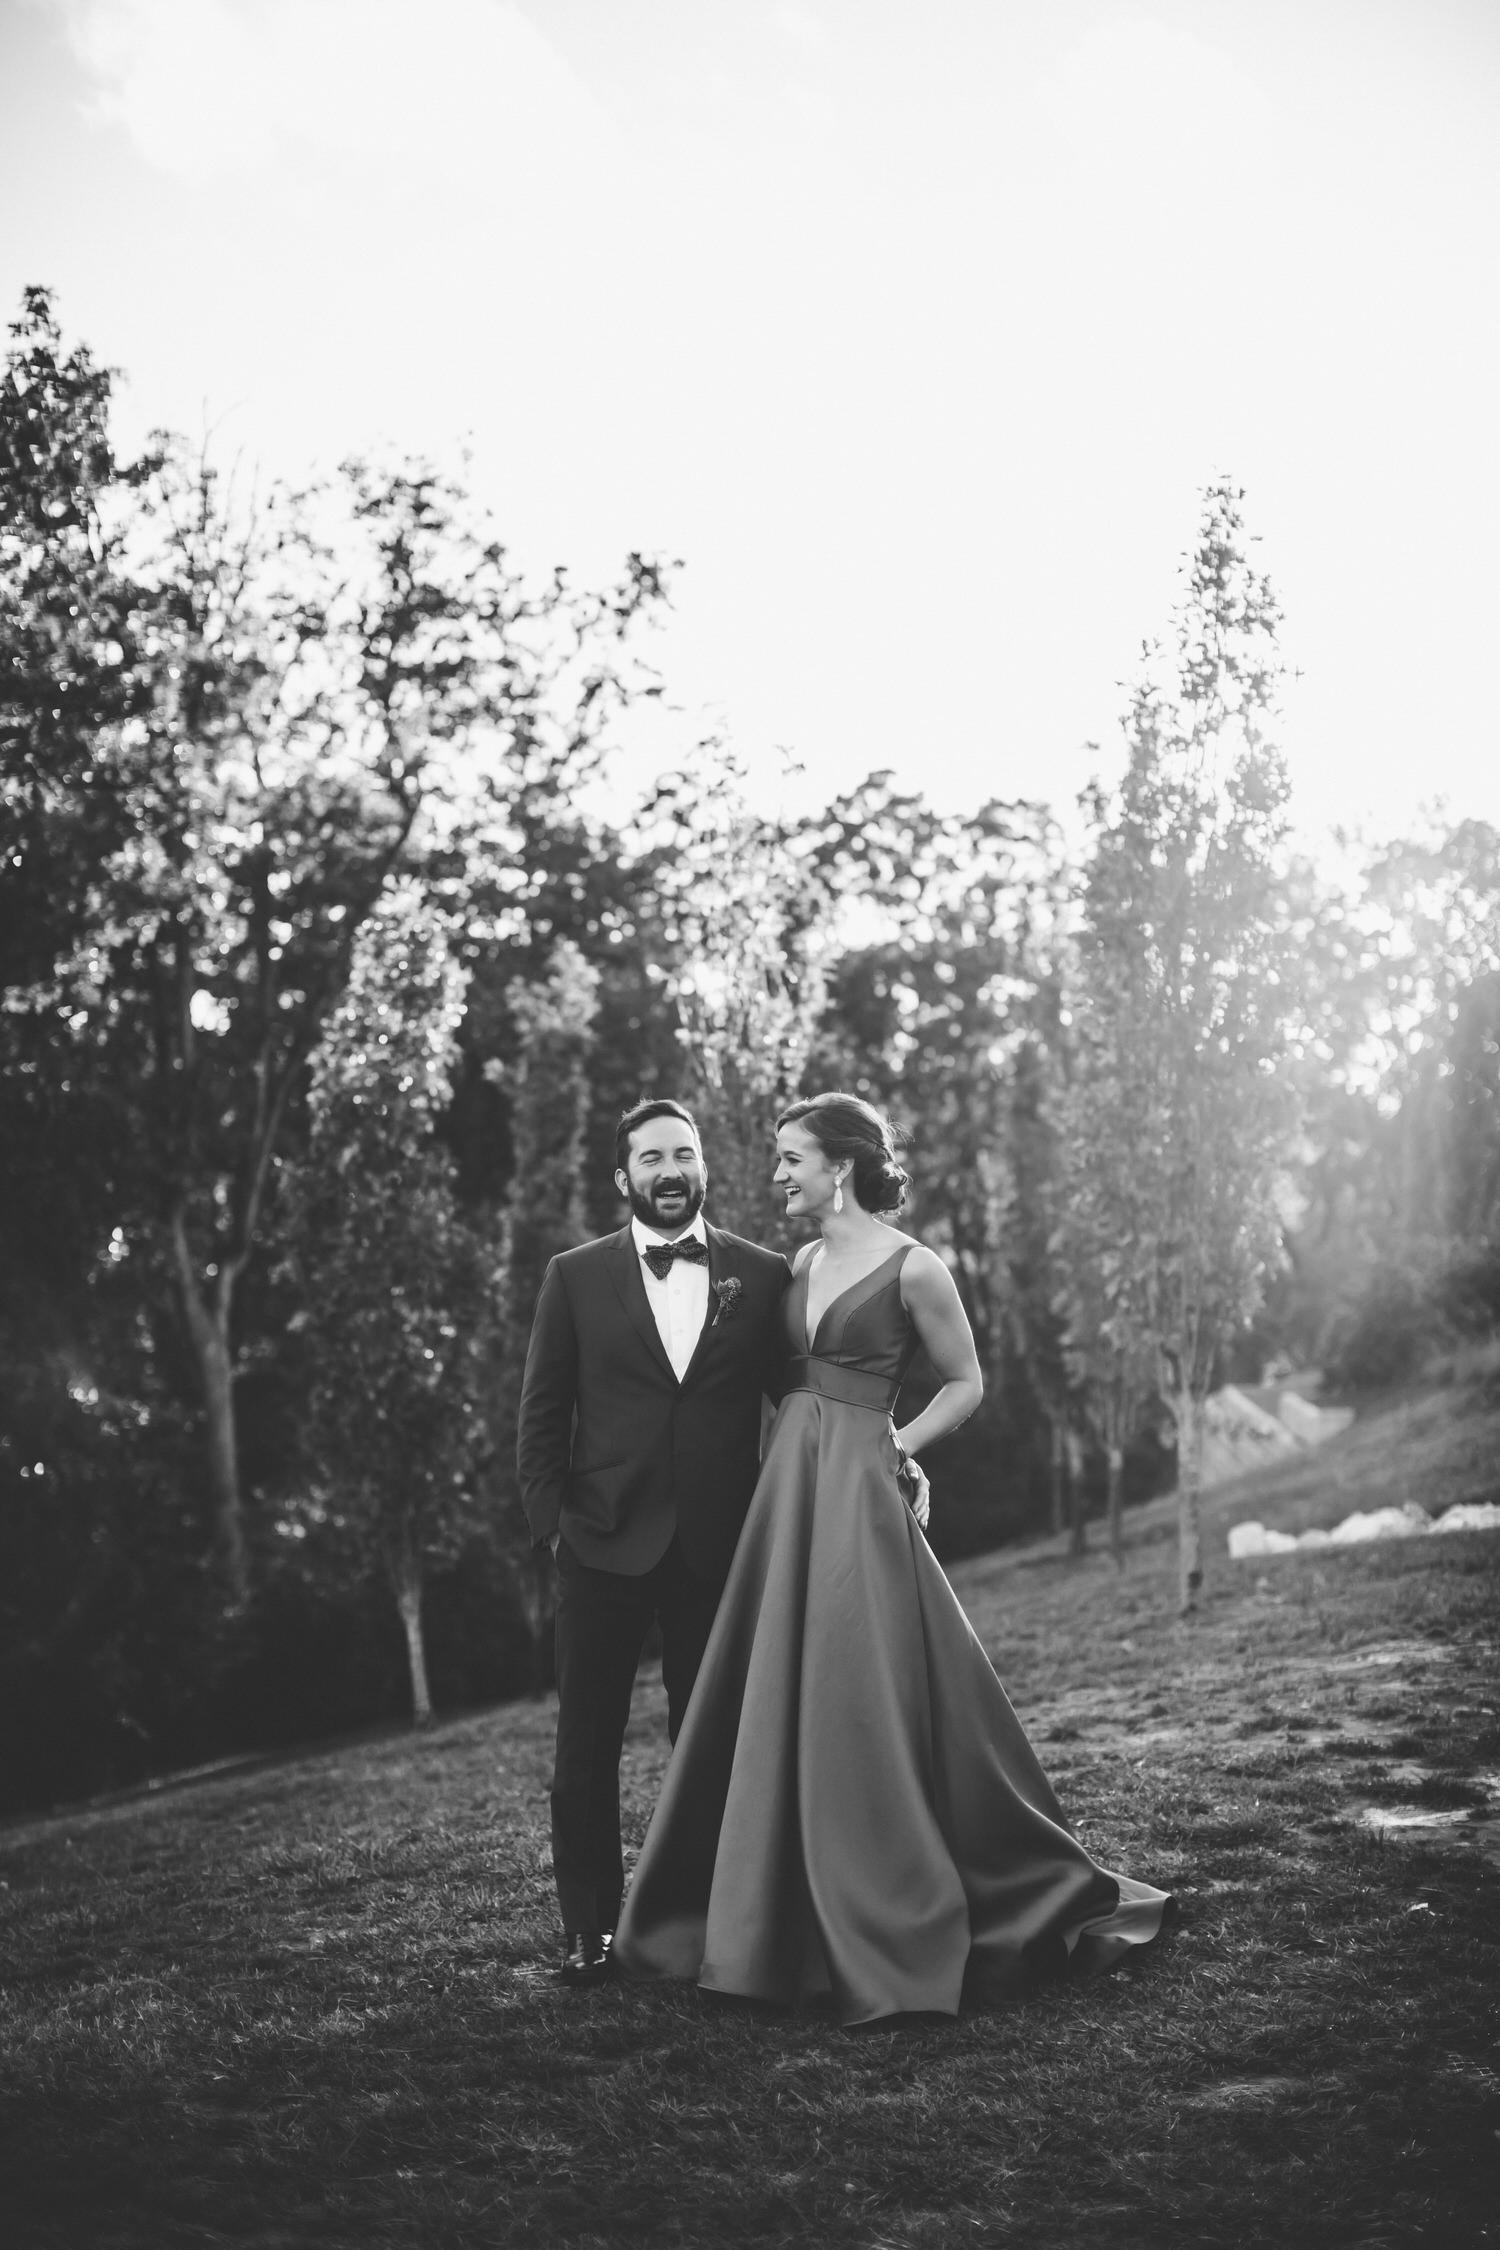 green wedding dress, seattle wedding photographer